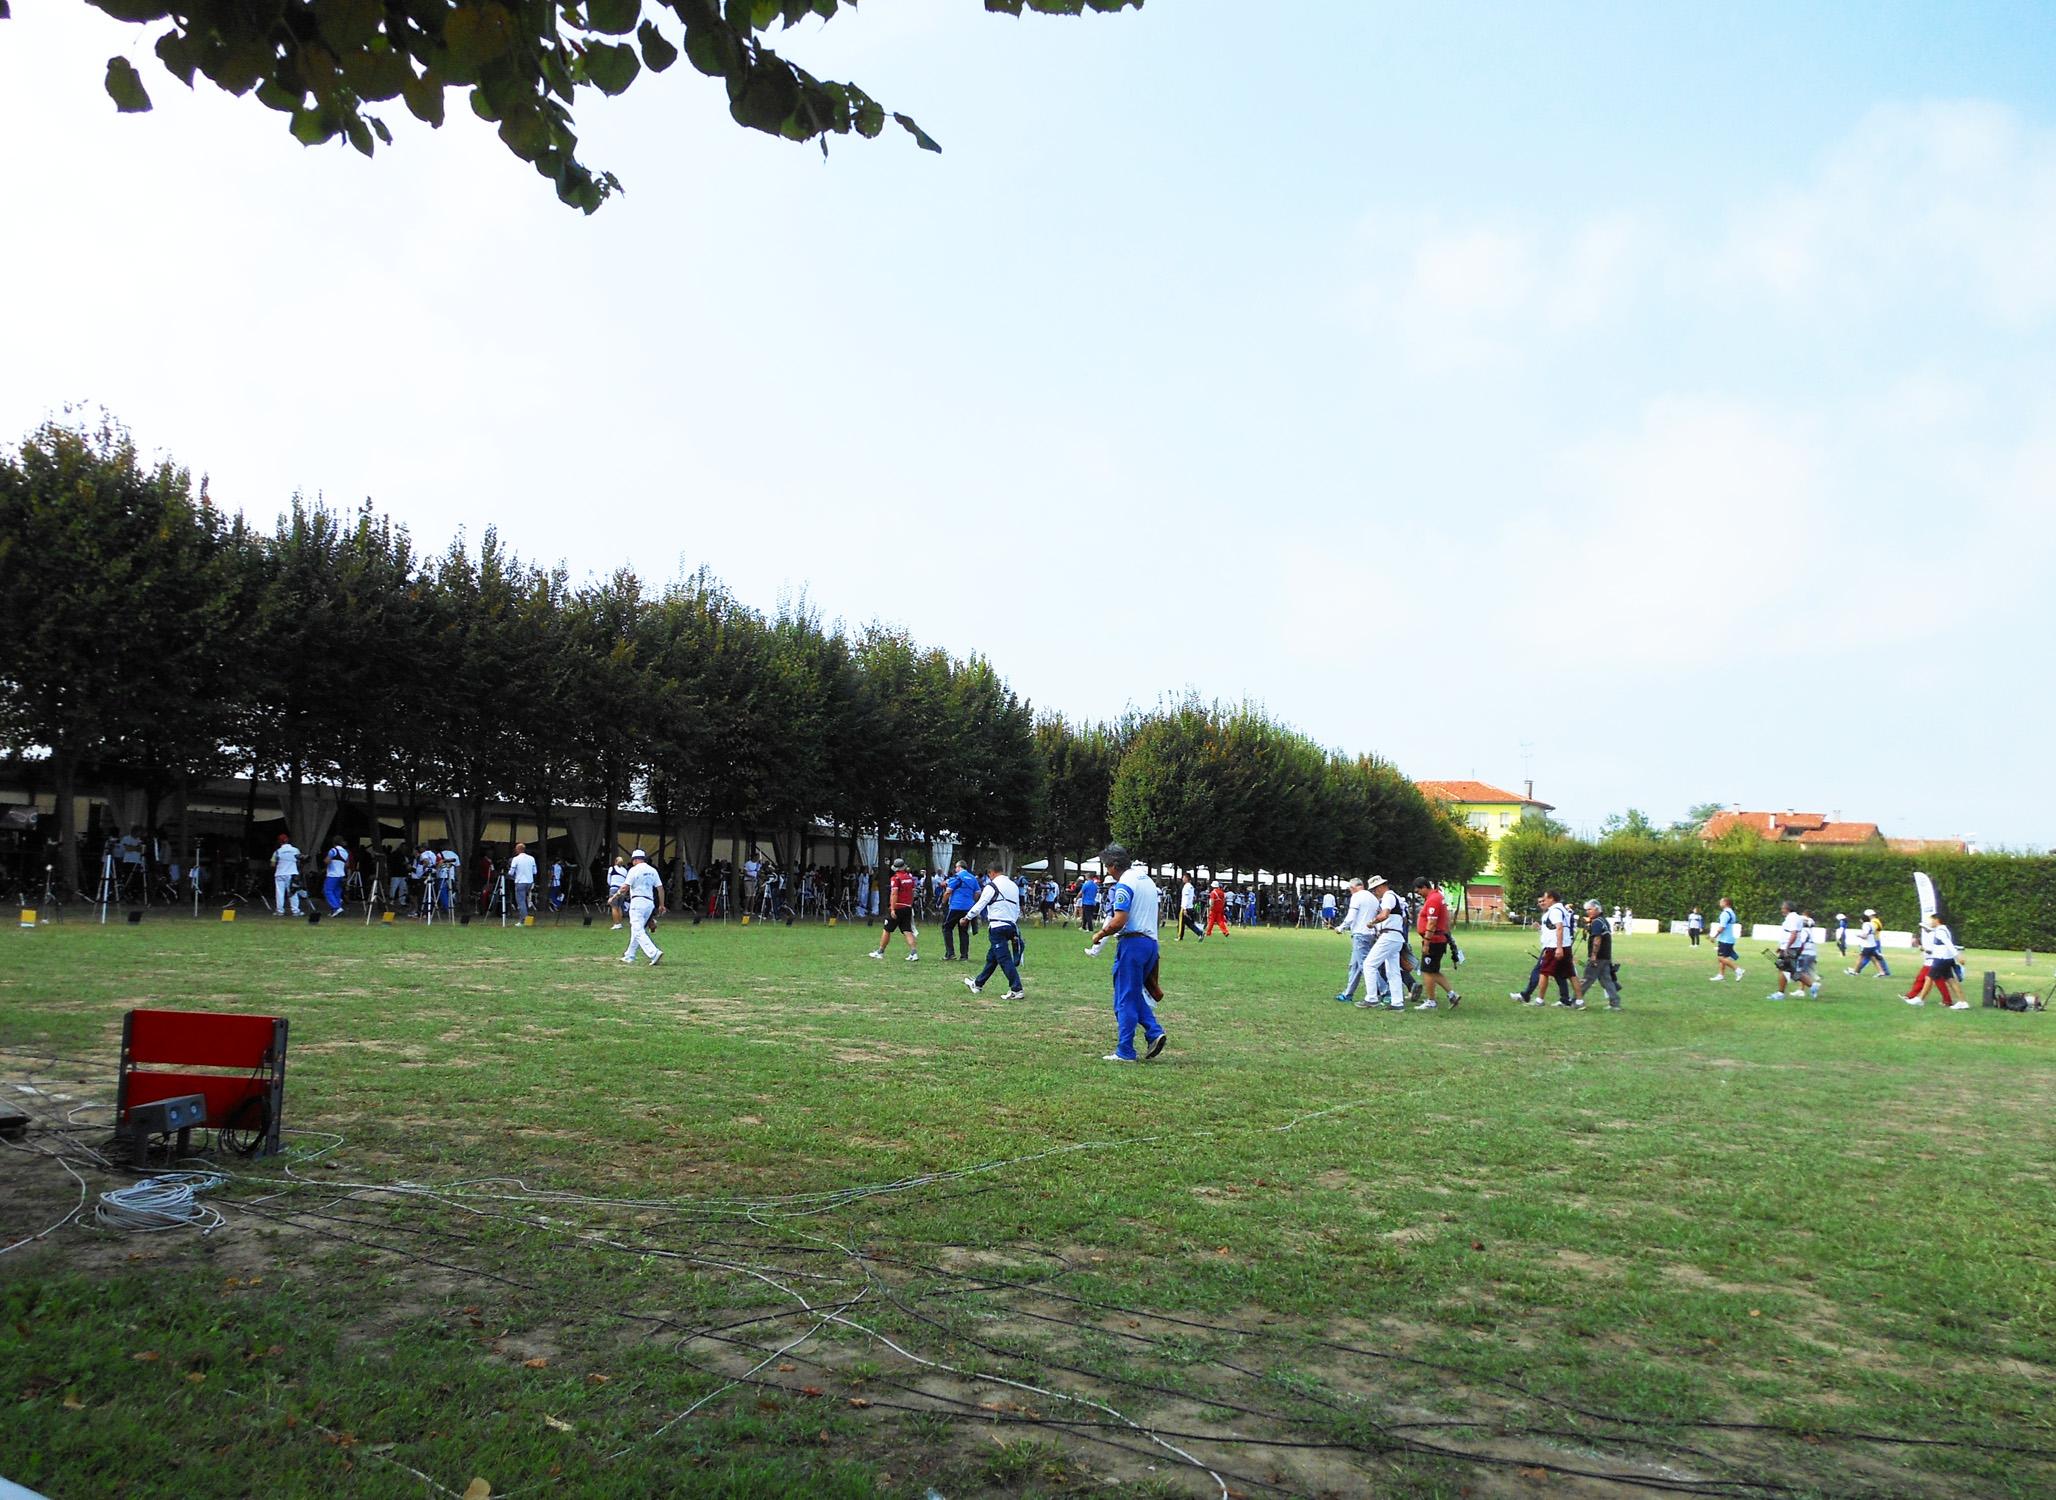 CampNazionali14-15_09_fine recupero